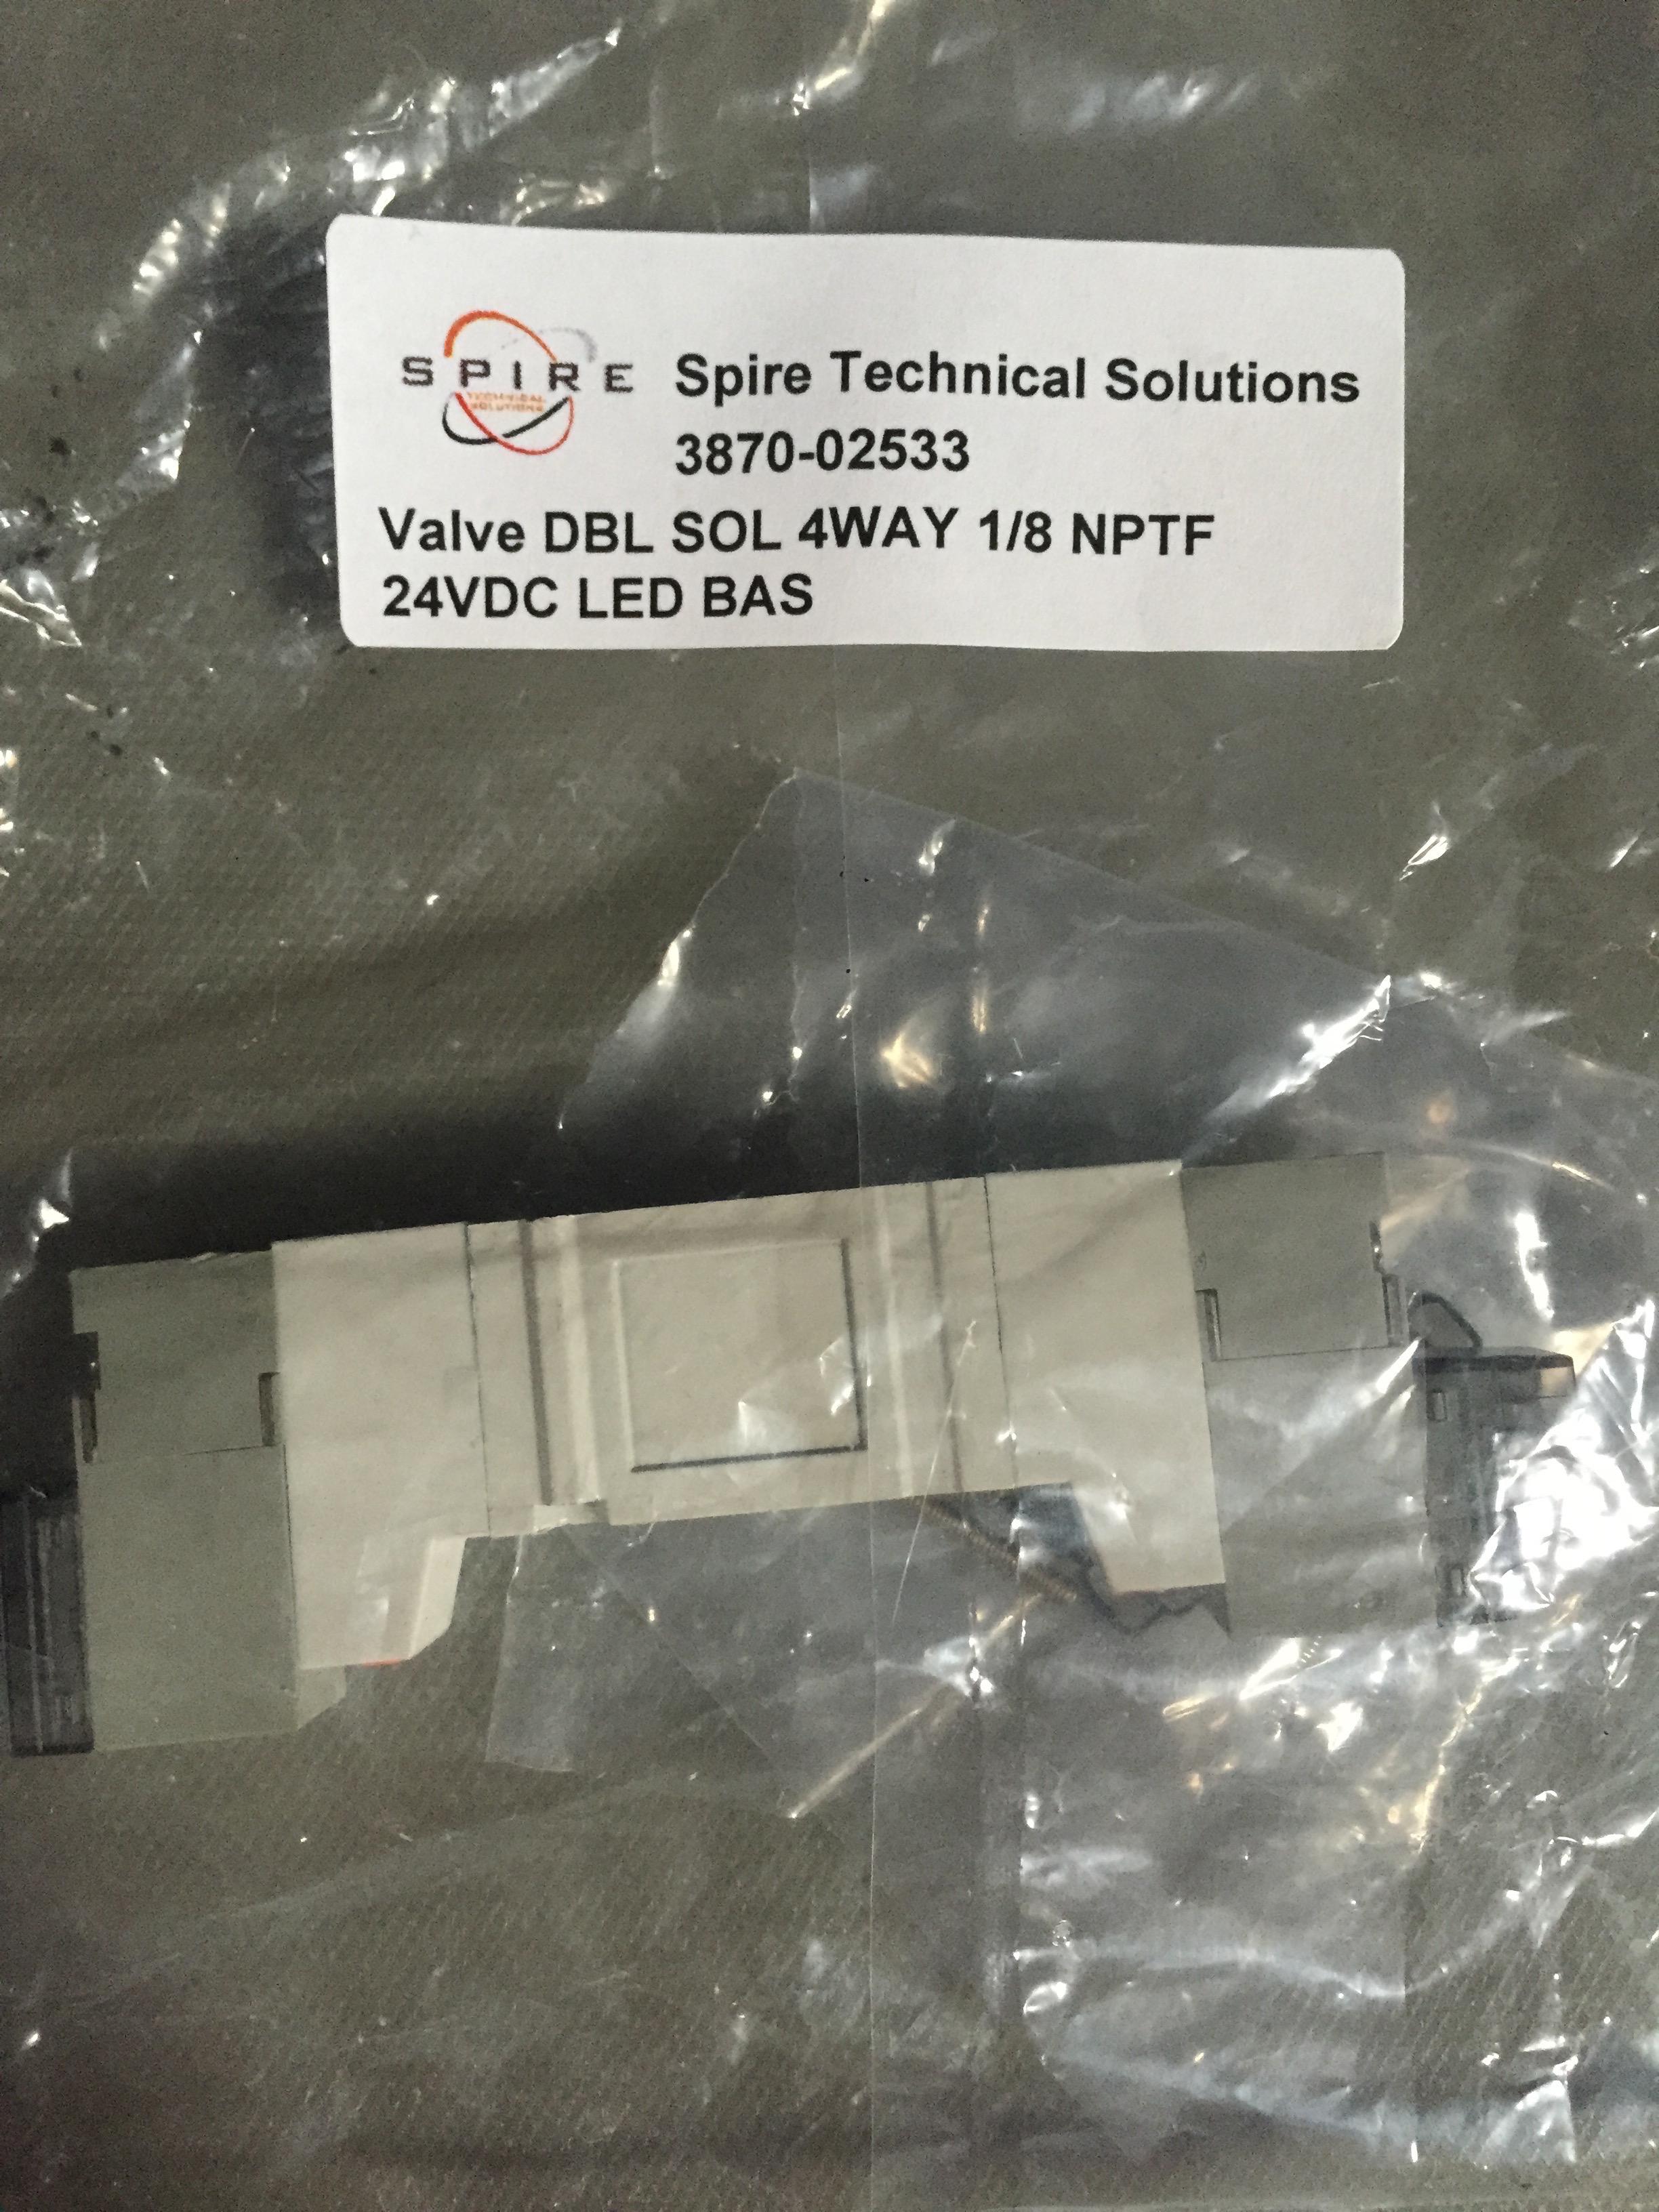 Valve DBL SOL 4WAY 1/8 NPTF 24VDC LED BAS